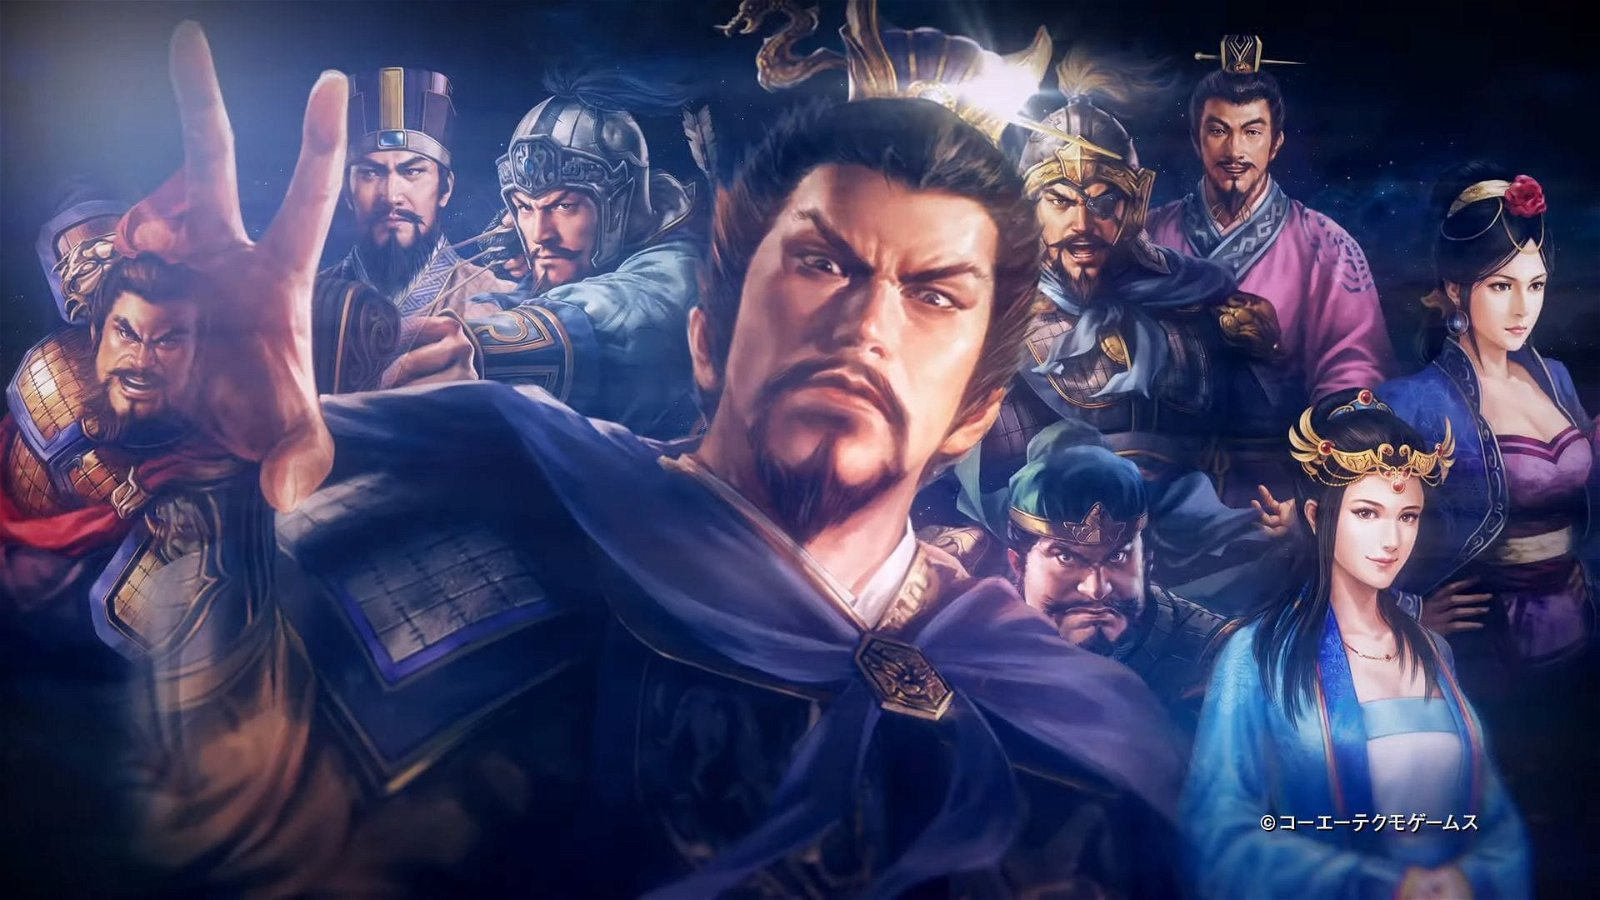 Romance of the Three Kingdoms XIV Update 1.25